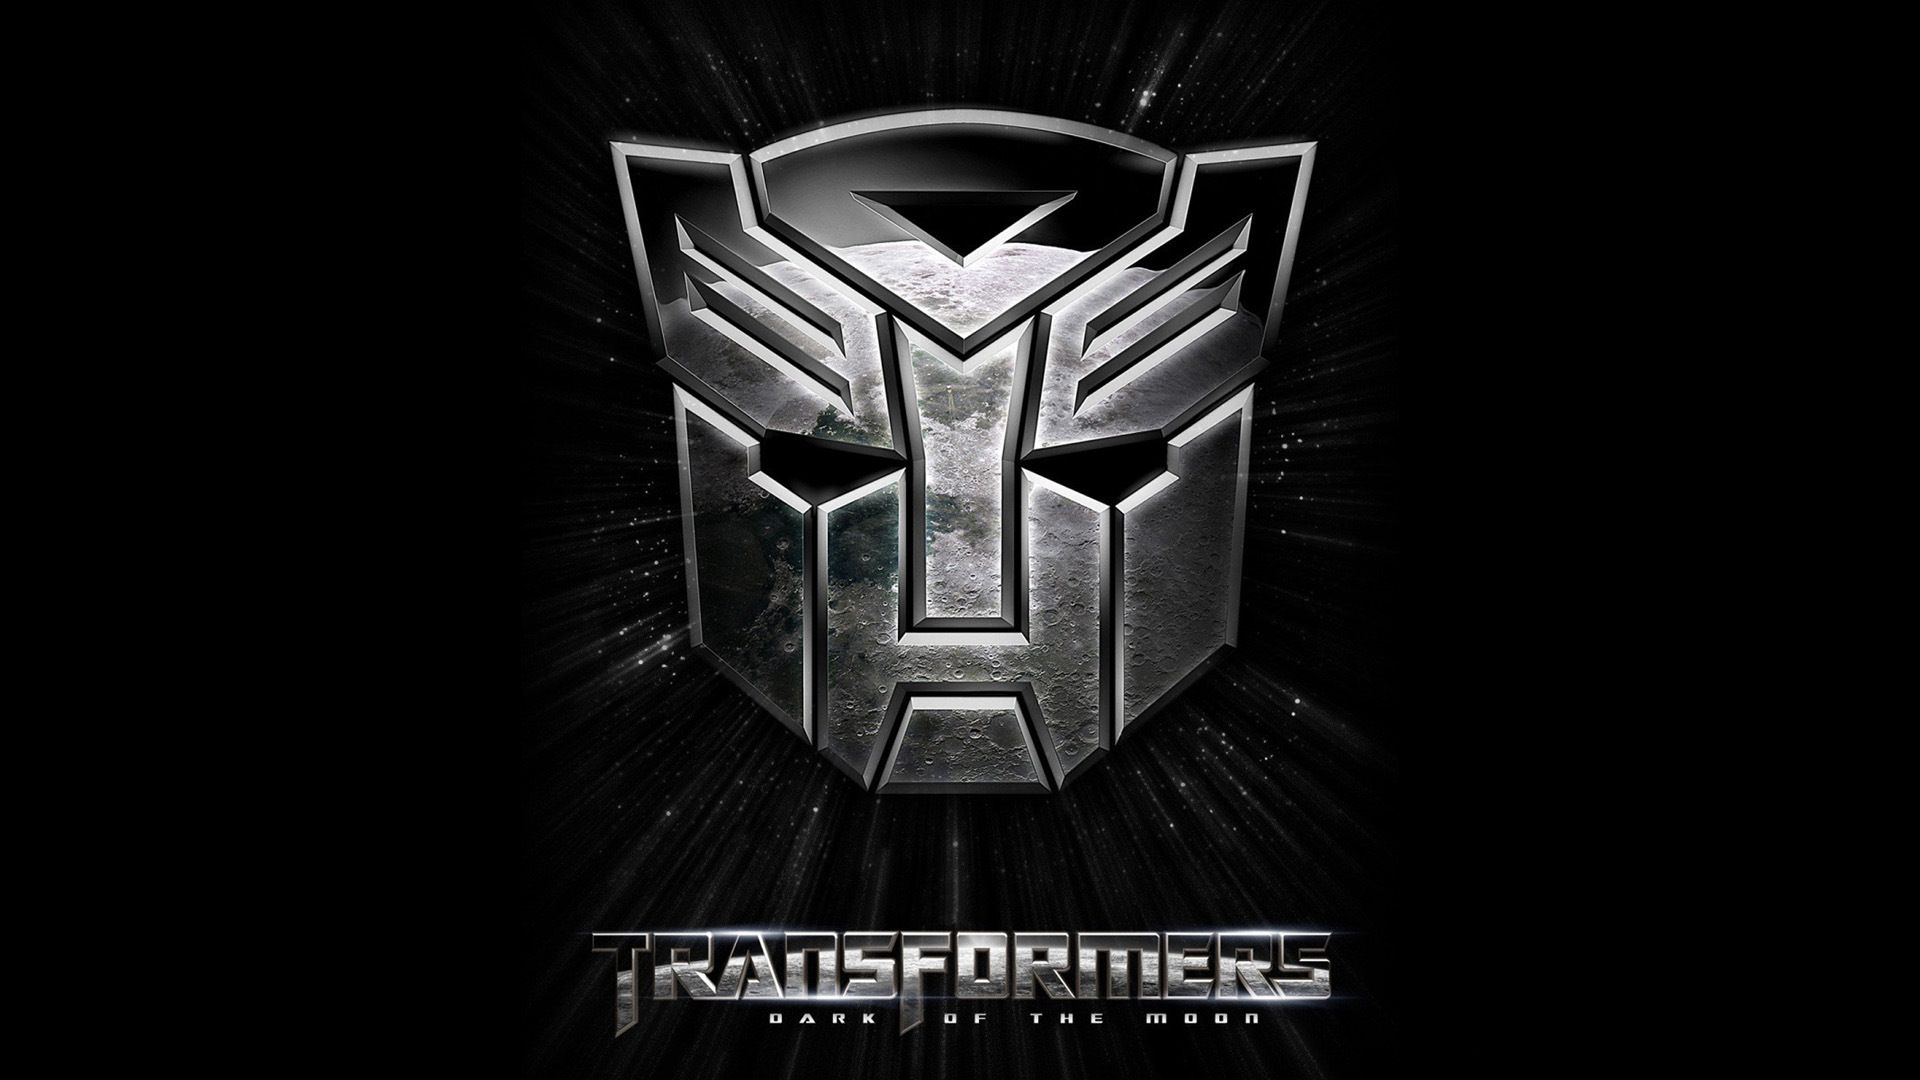 Autobots Logo Transformers Pictures Autobots Logo Decepticon Logo Transformers